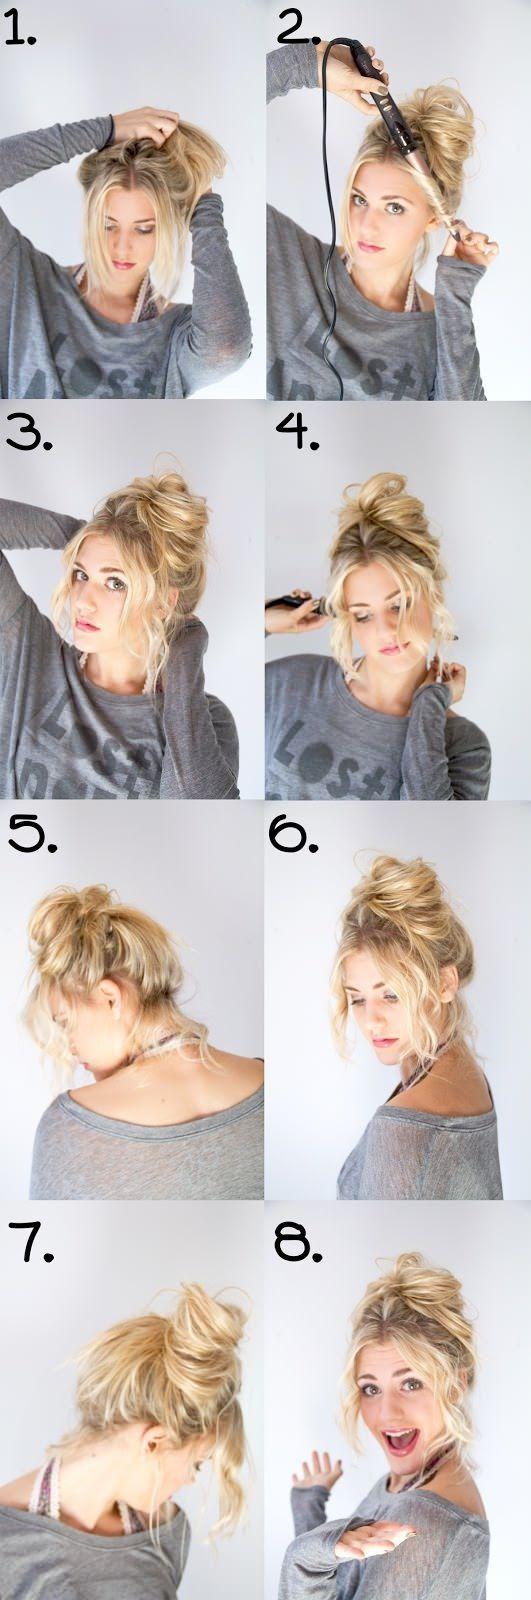 Simple cute messy hairstyle hairkapsels dames meisjes